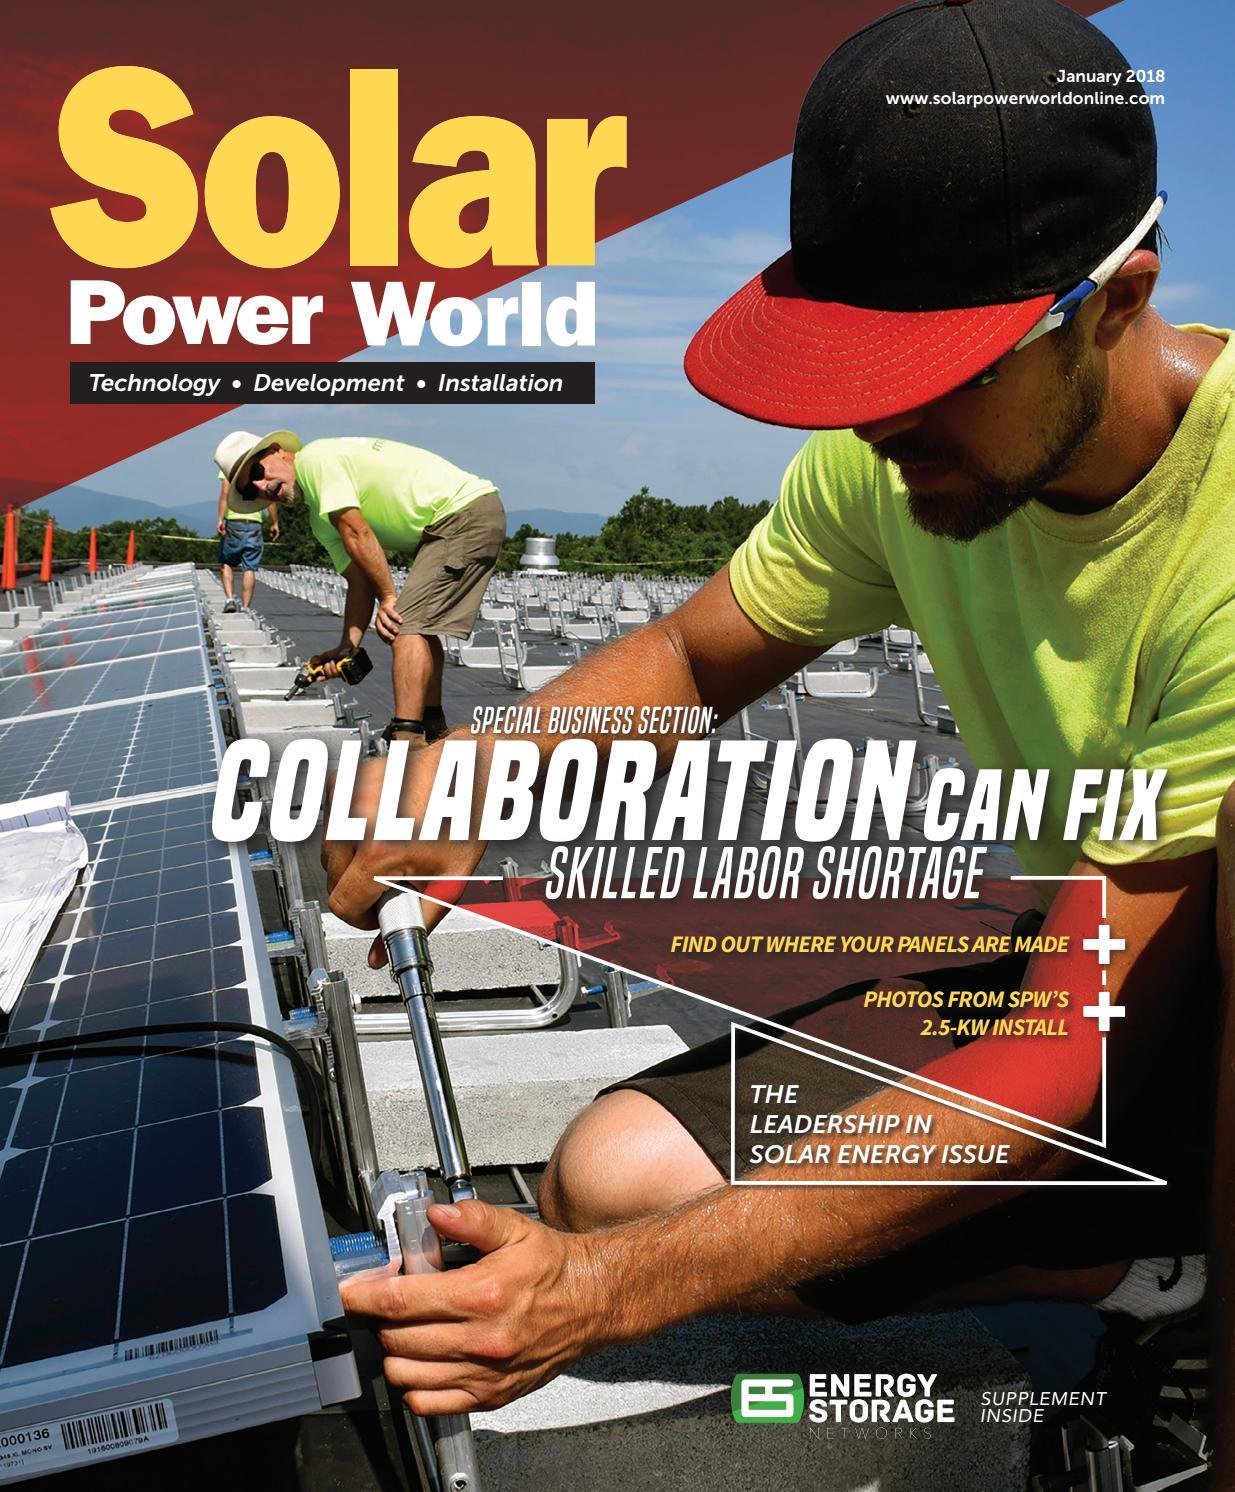 Solar Power World January 2018 By Wtwh Media Llc Issuu Crazy Telephone Wiring India